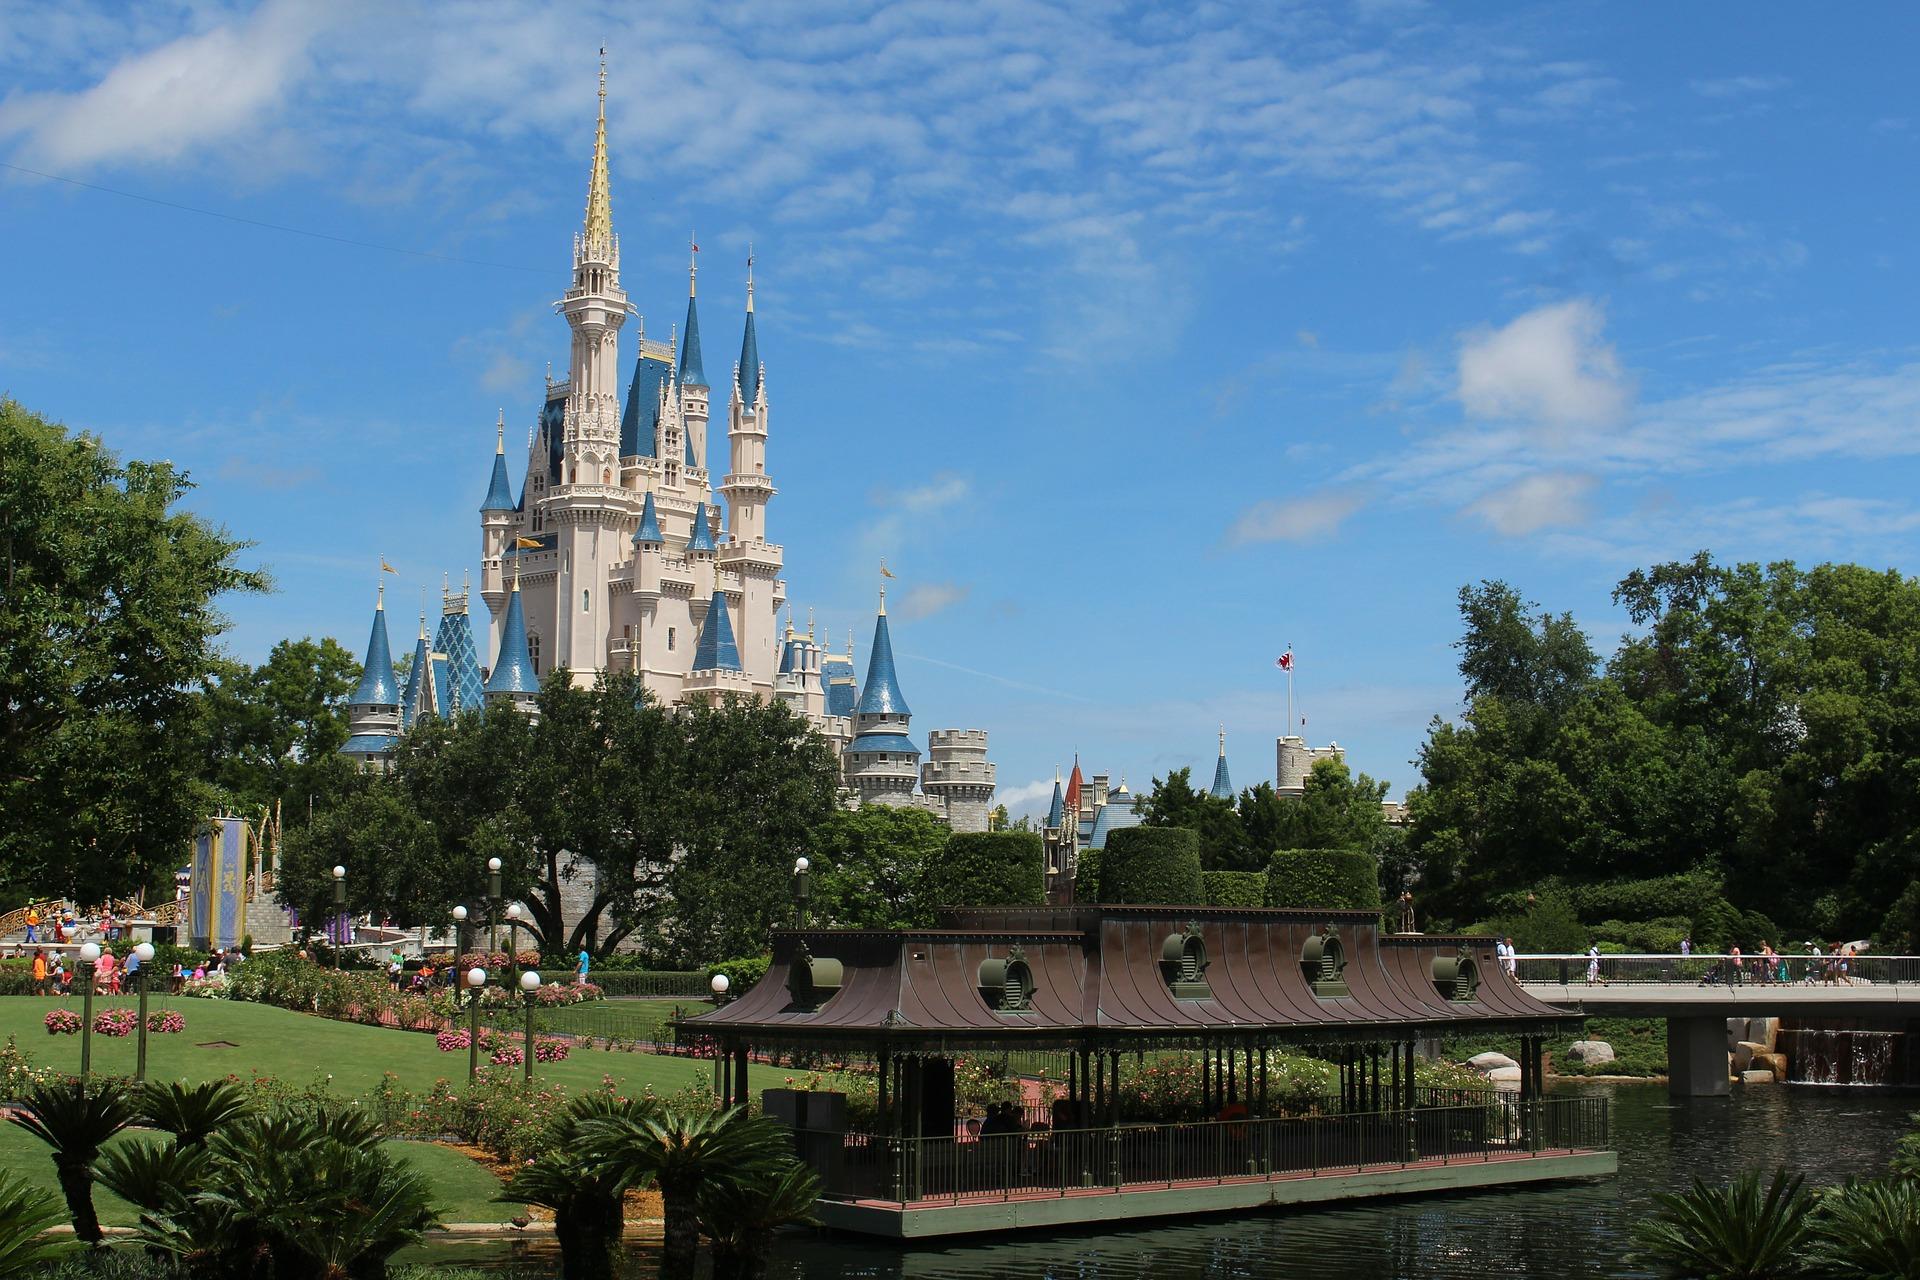 Cinderella Castle - Walt Disney World, Orlando, FL